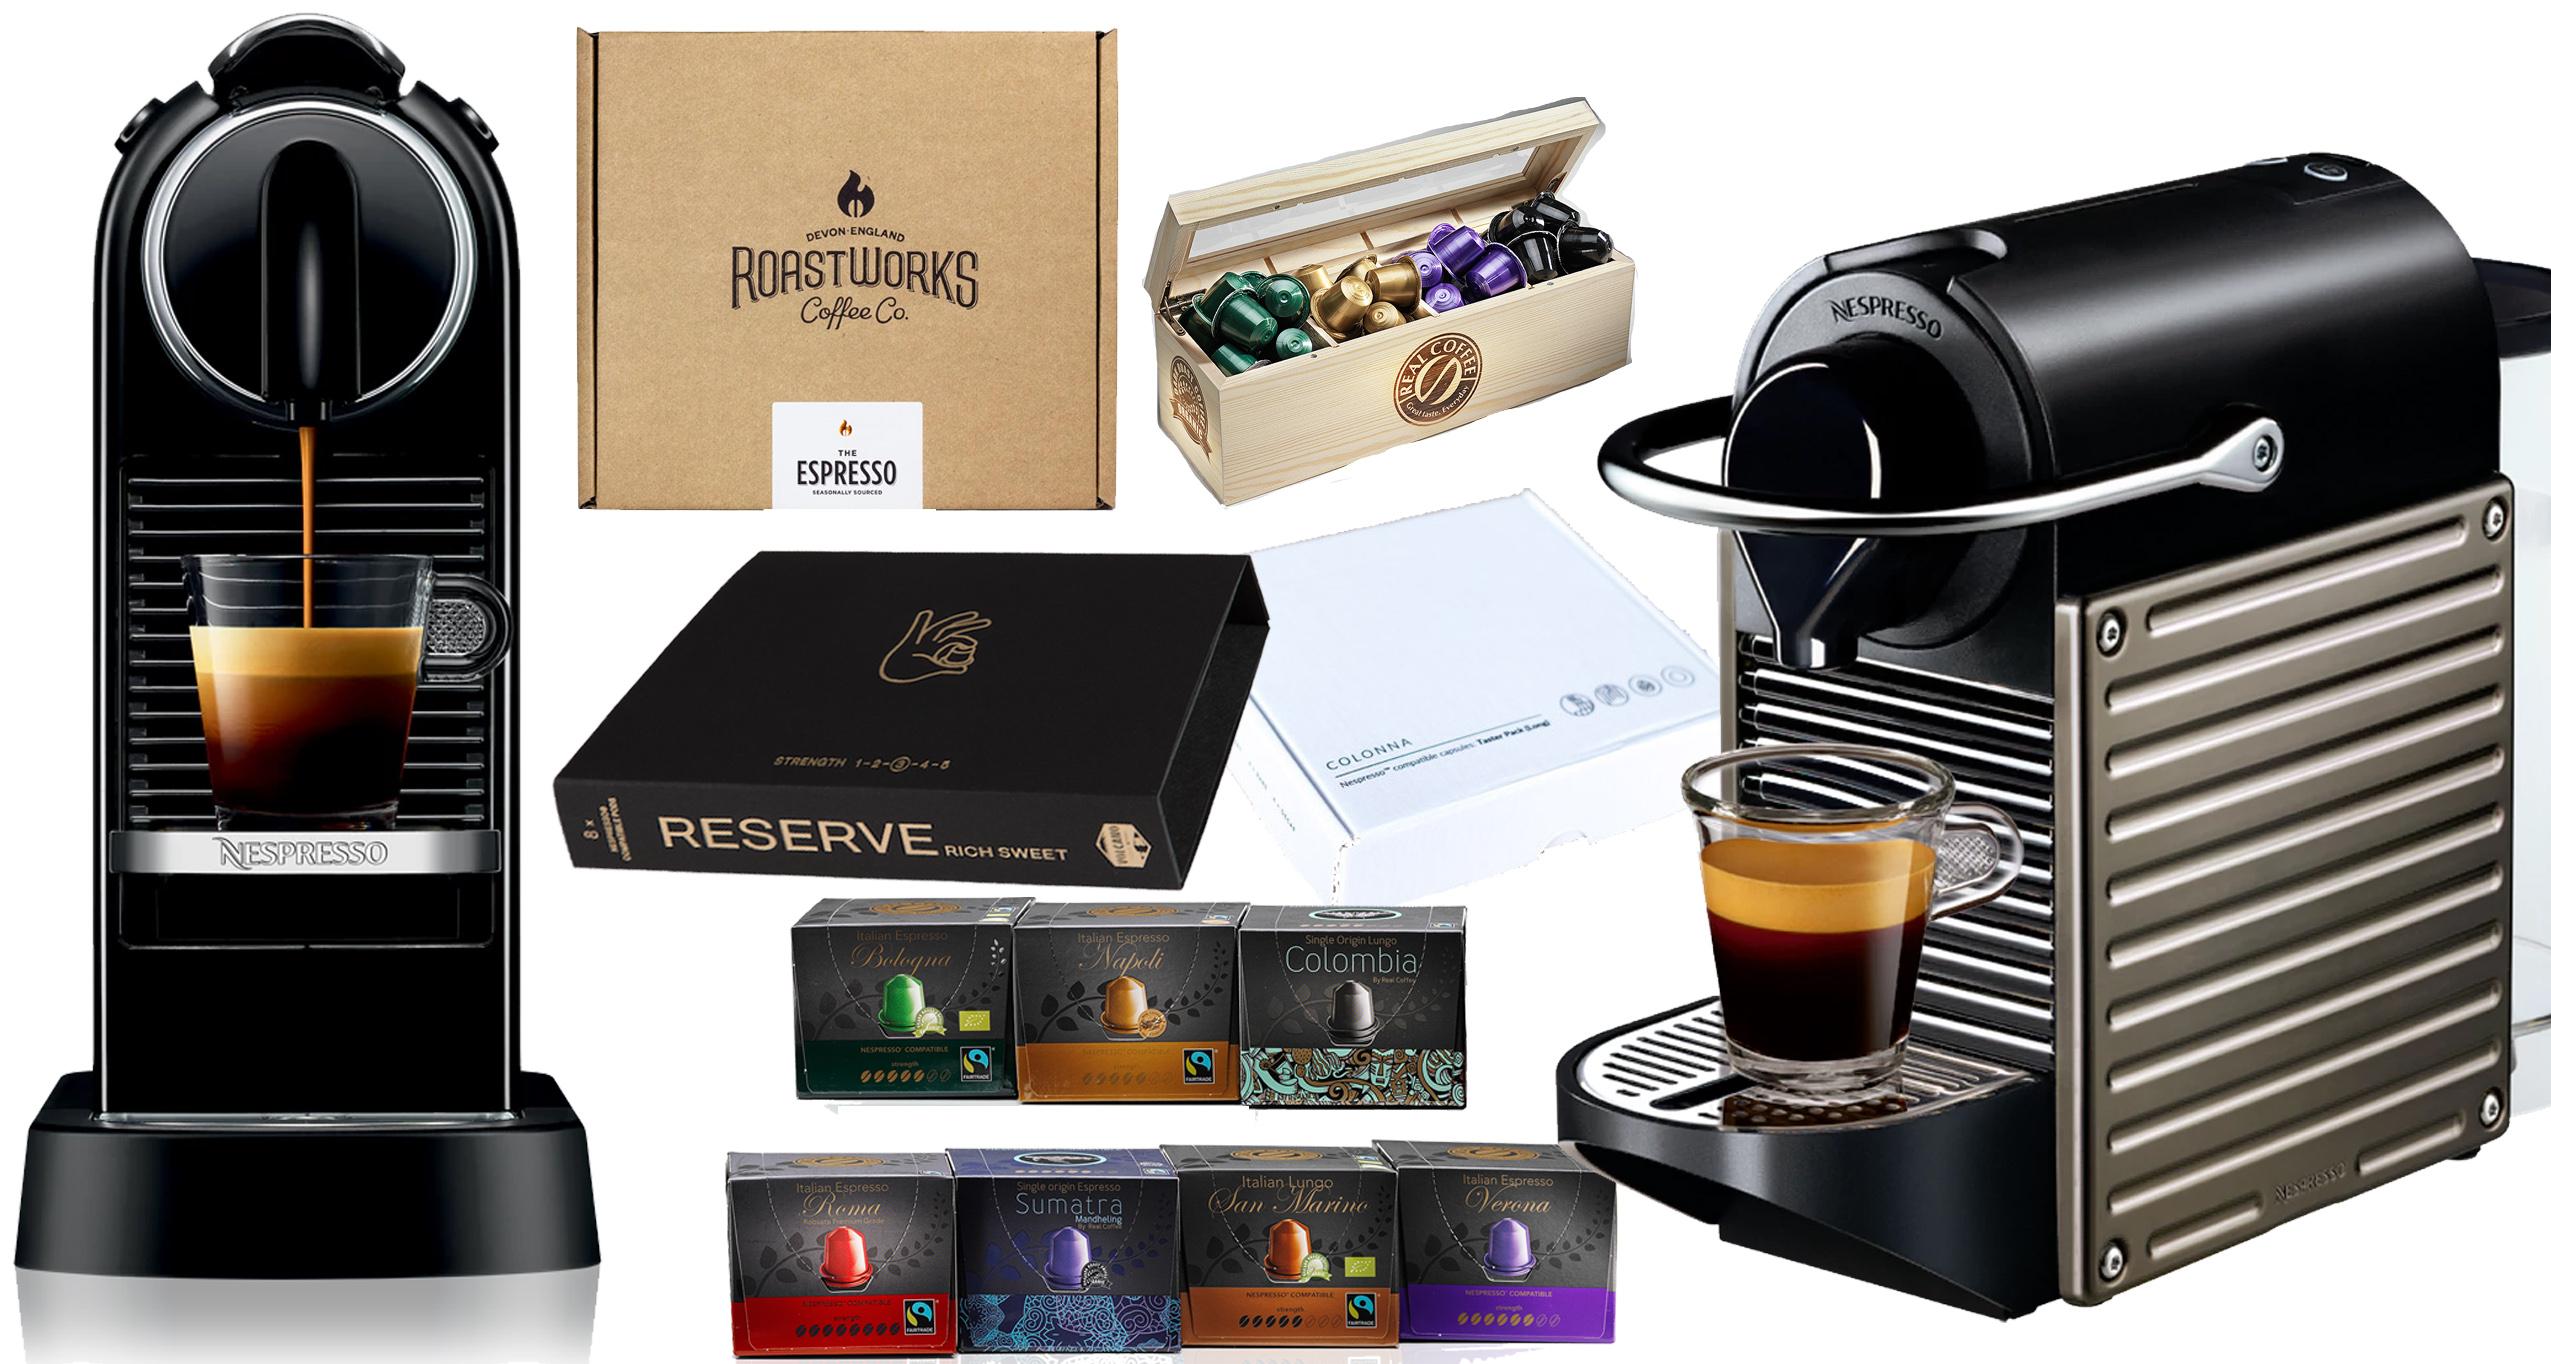 Nespresso Compatible Pods & Speciality Coffee?